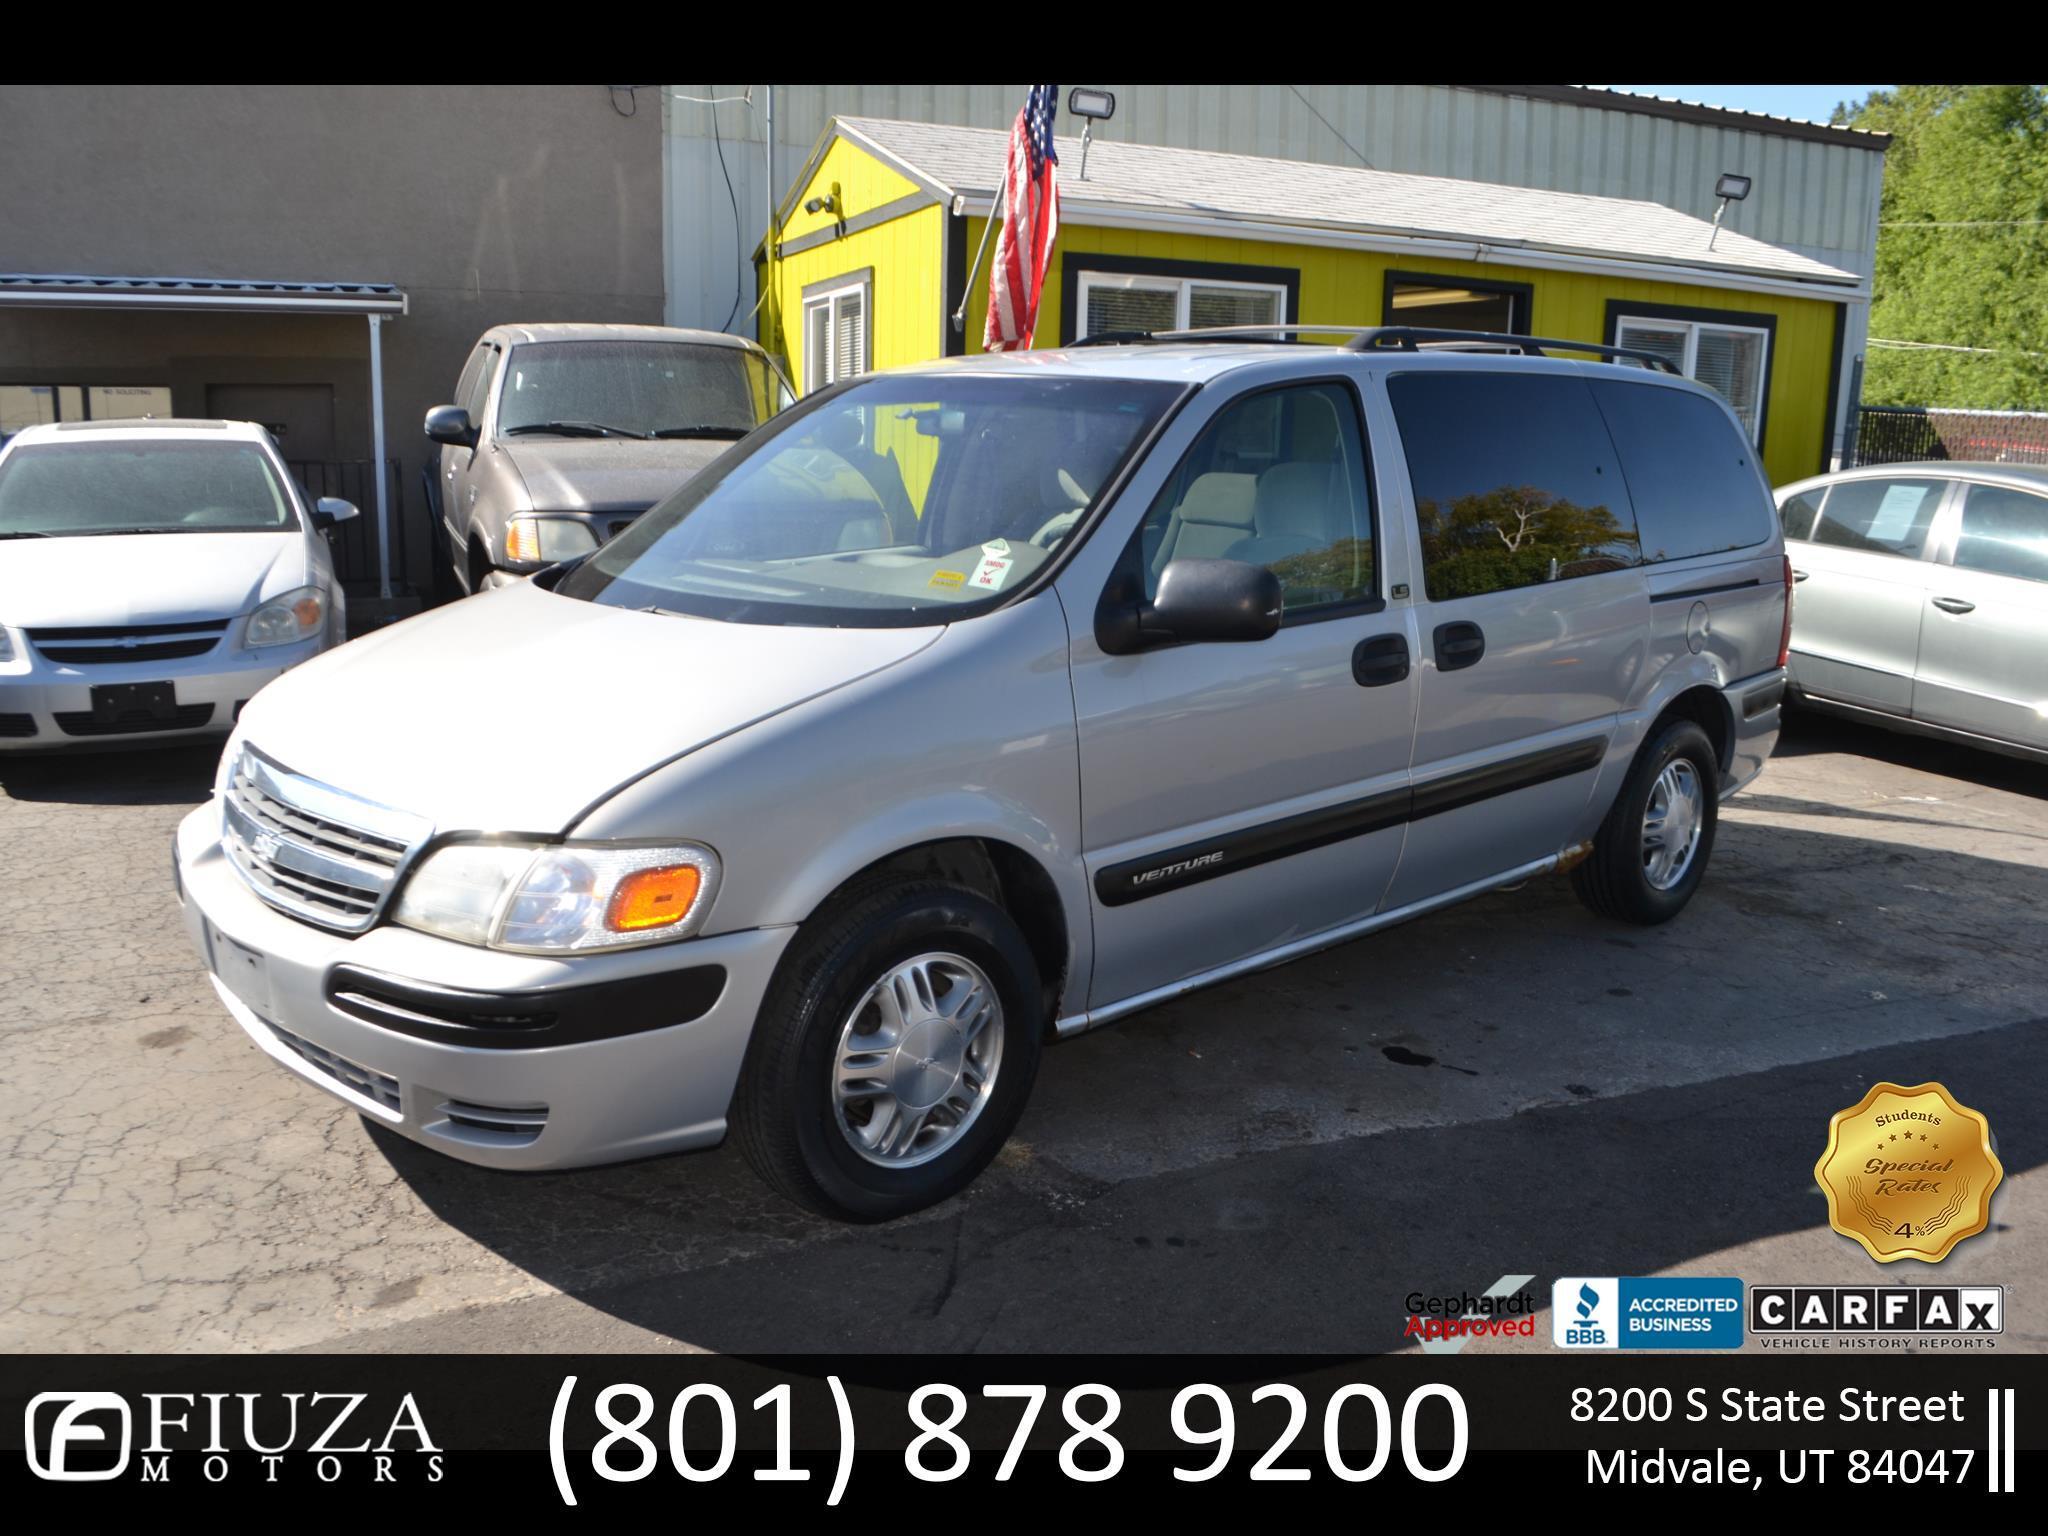 2001 Chevrolet Venture Plus Extended